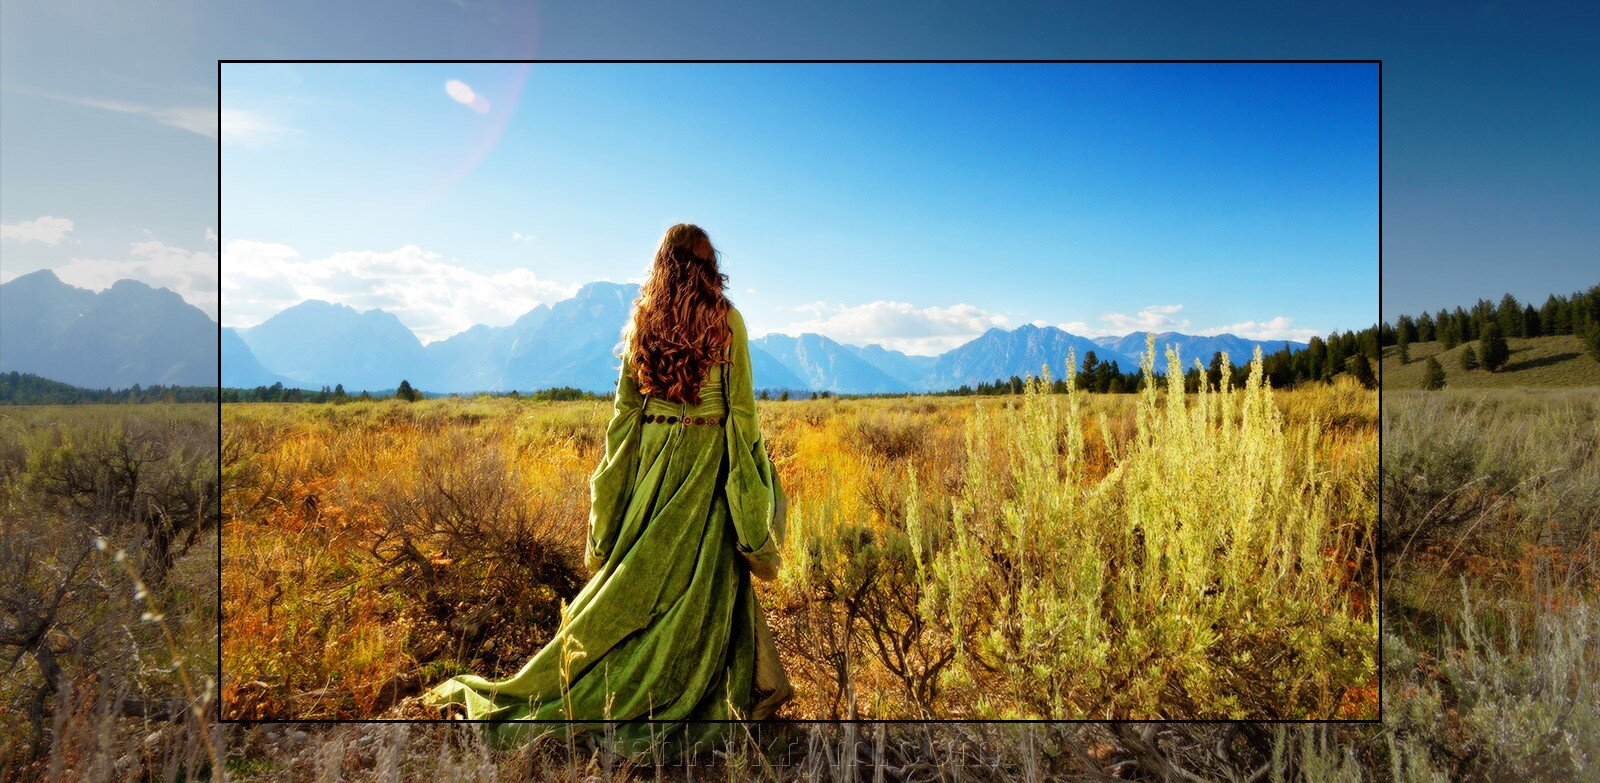 Smart телевизор LG 43UN71006LB, Ultra HD, черный, webOS 5.0 - фото pic_ce629a7eb6539490fae4e8f7b89d88c7_1920x9000_1.jpg